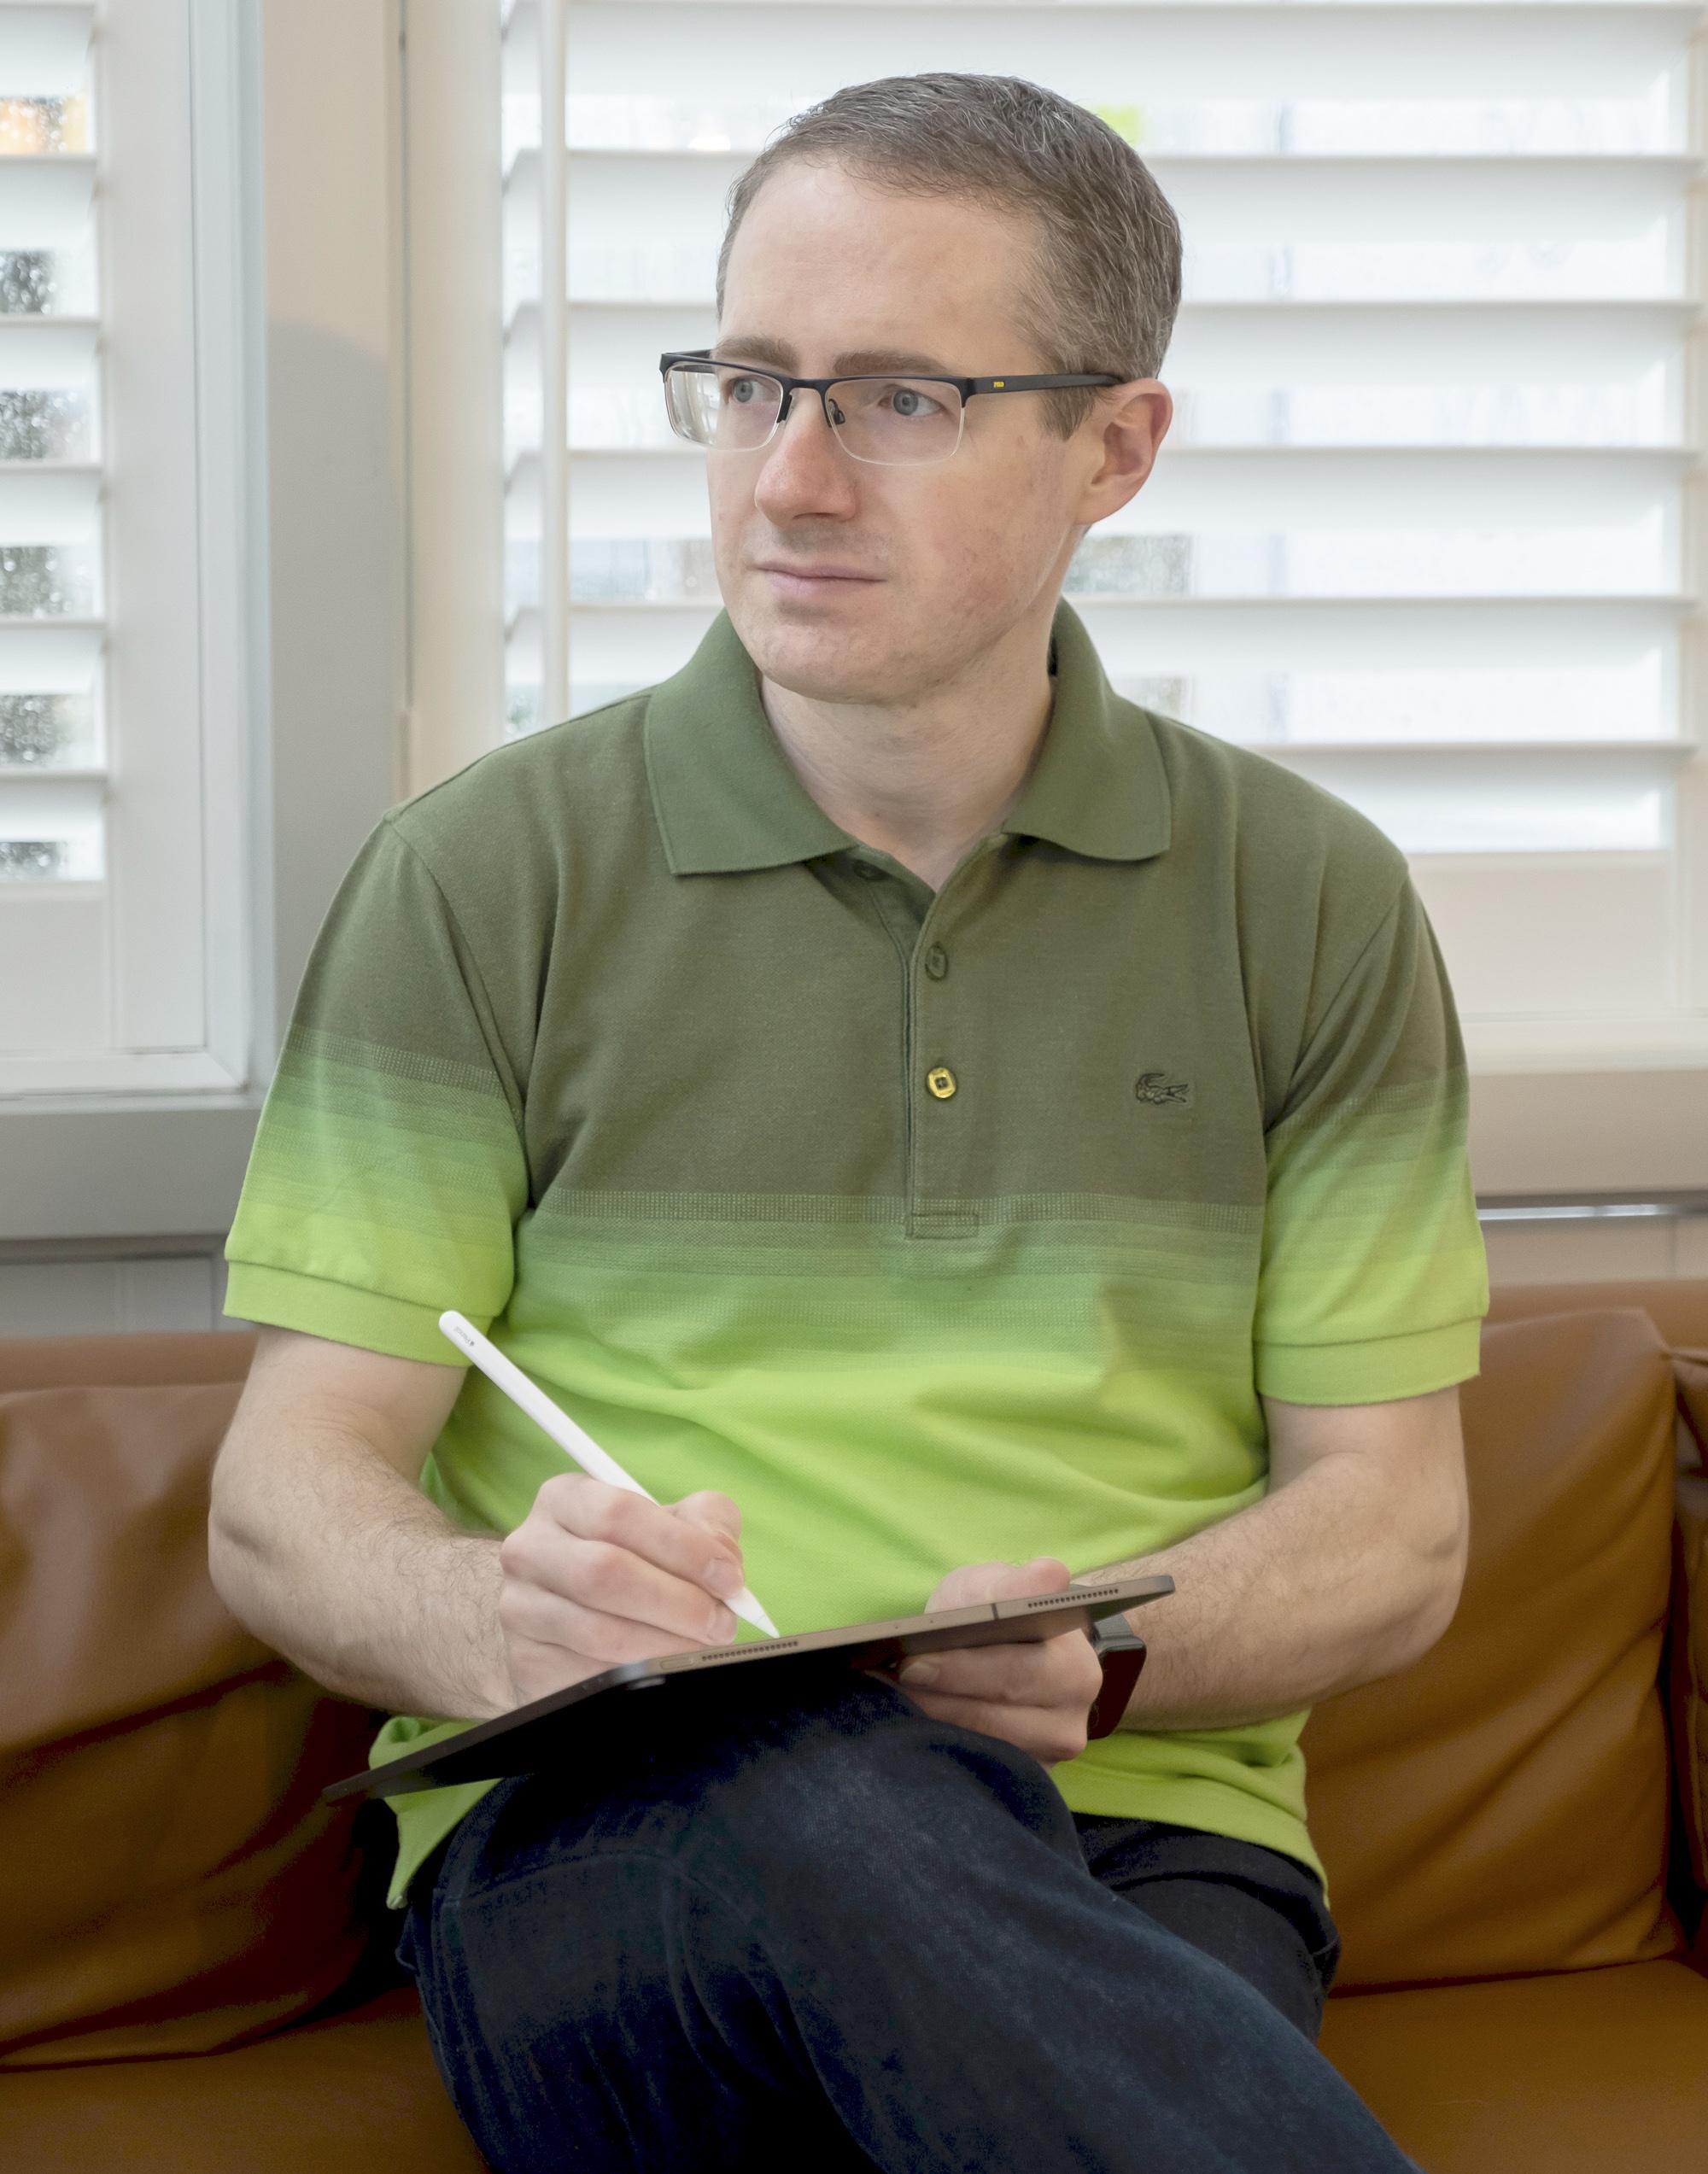 Christian Newman   HealthAnxiety.coach  founder